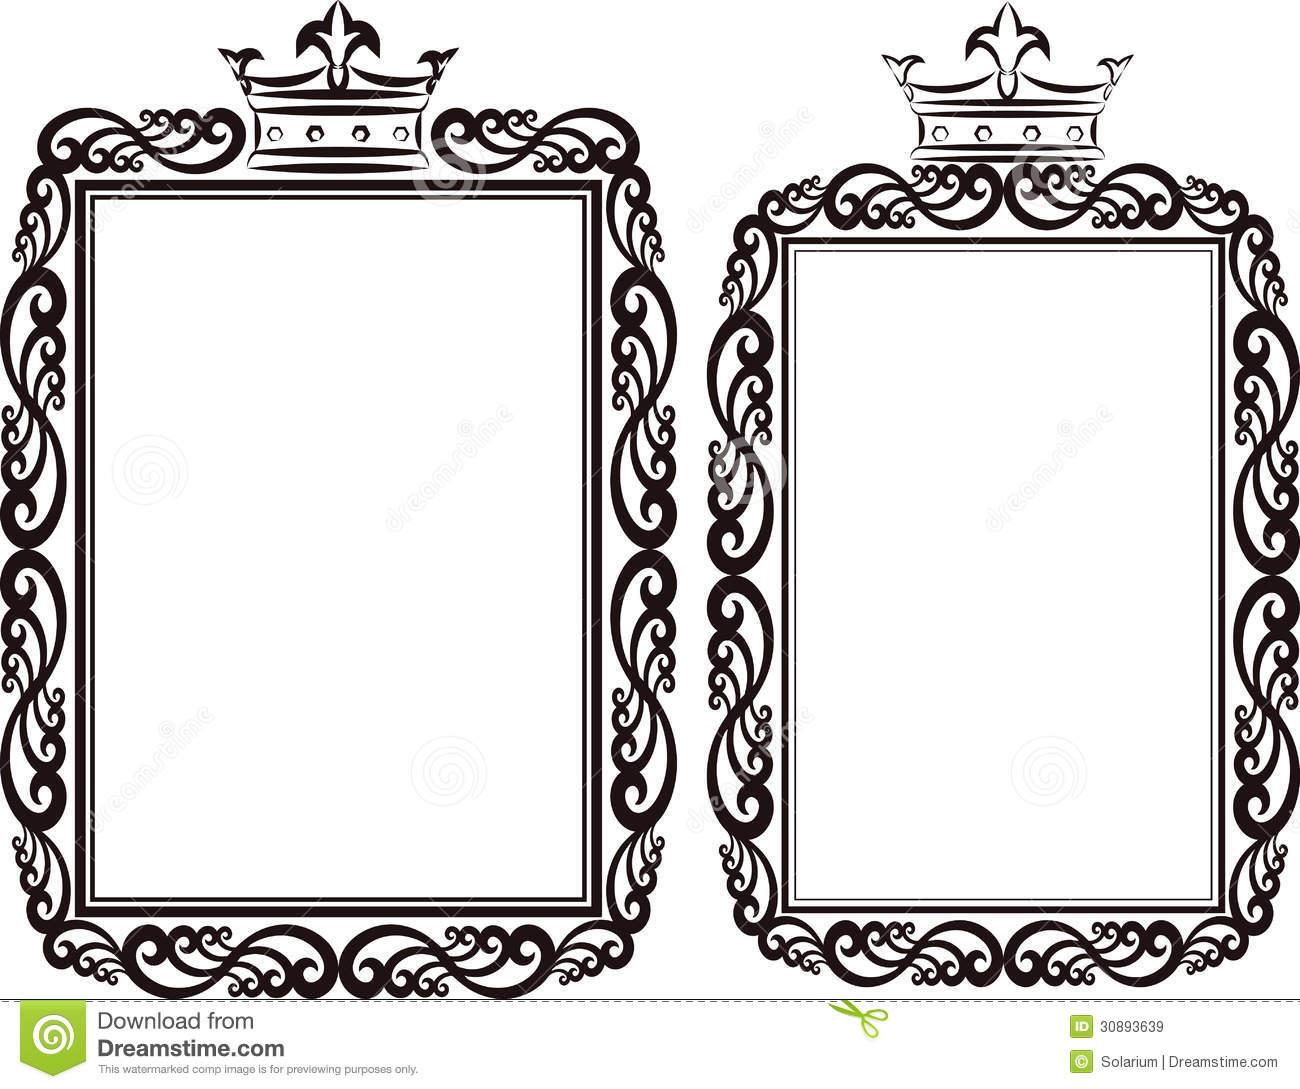 1300x1089 Tiara Border Clip Art